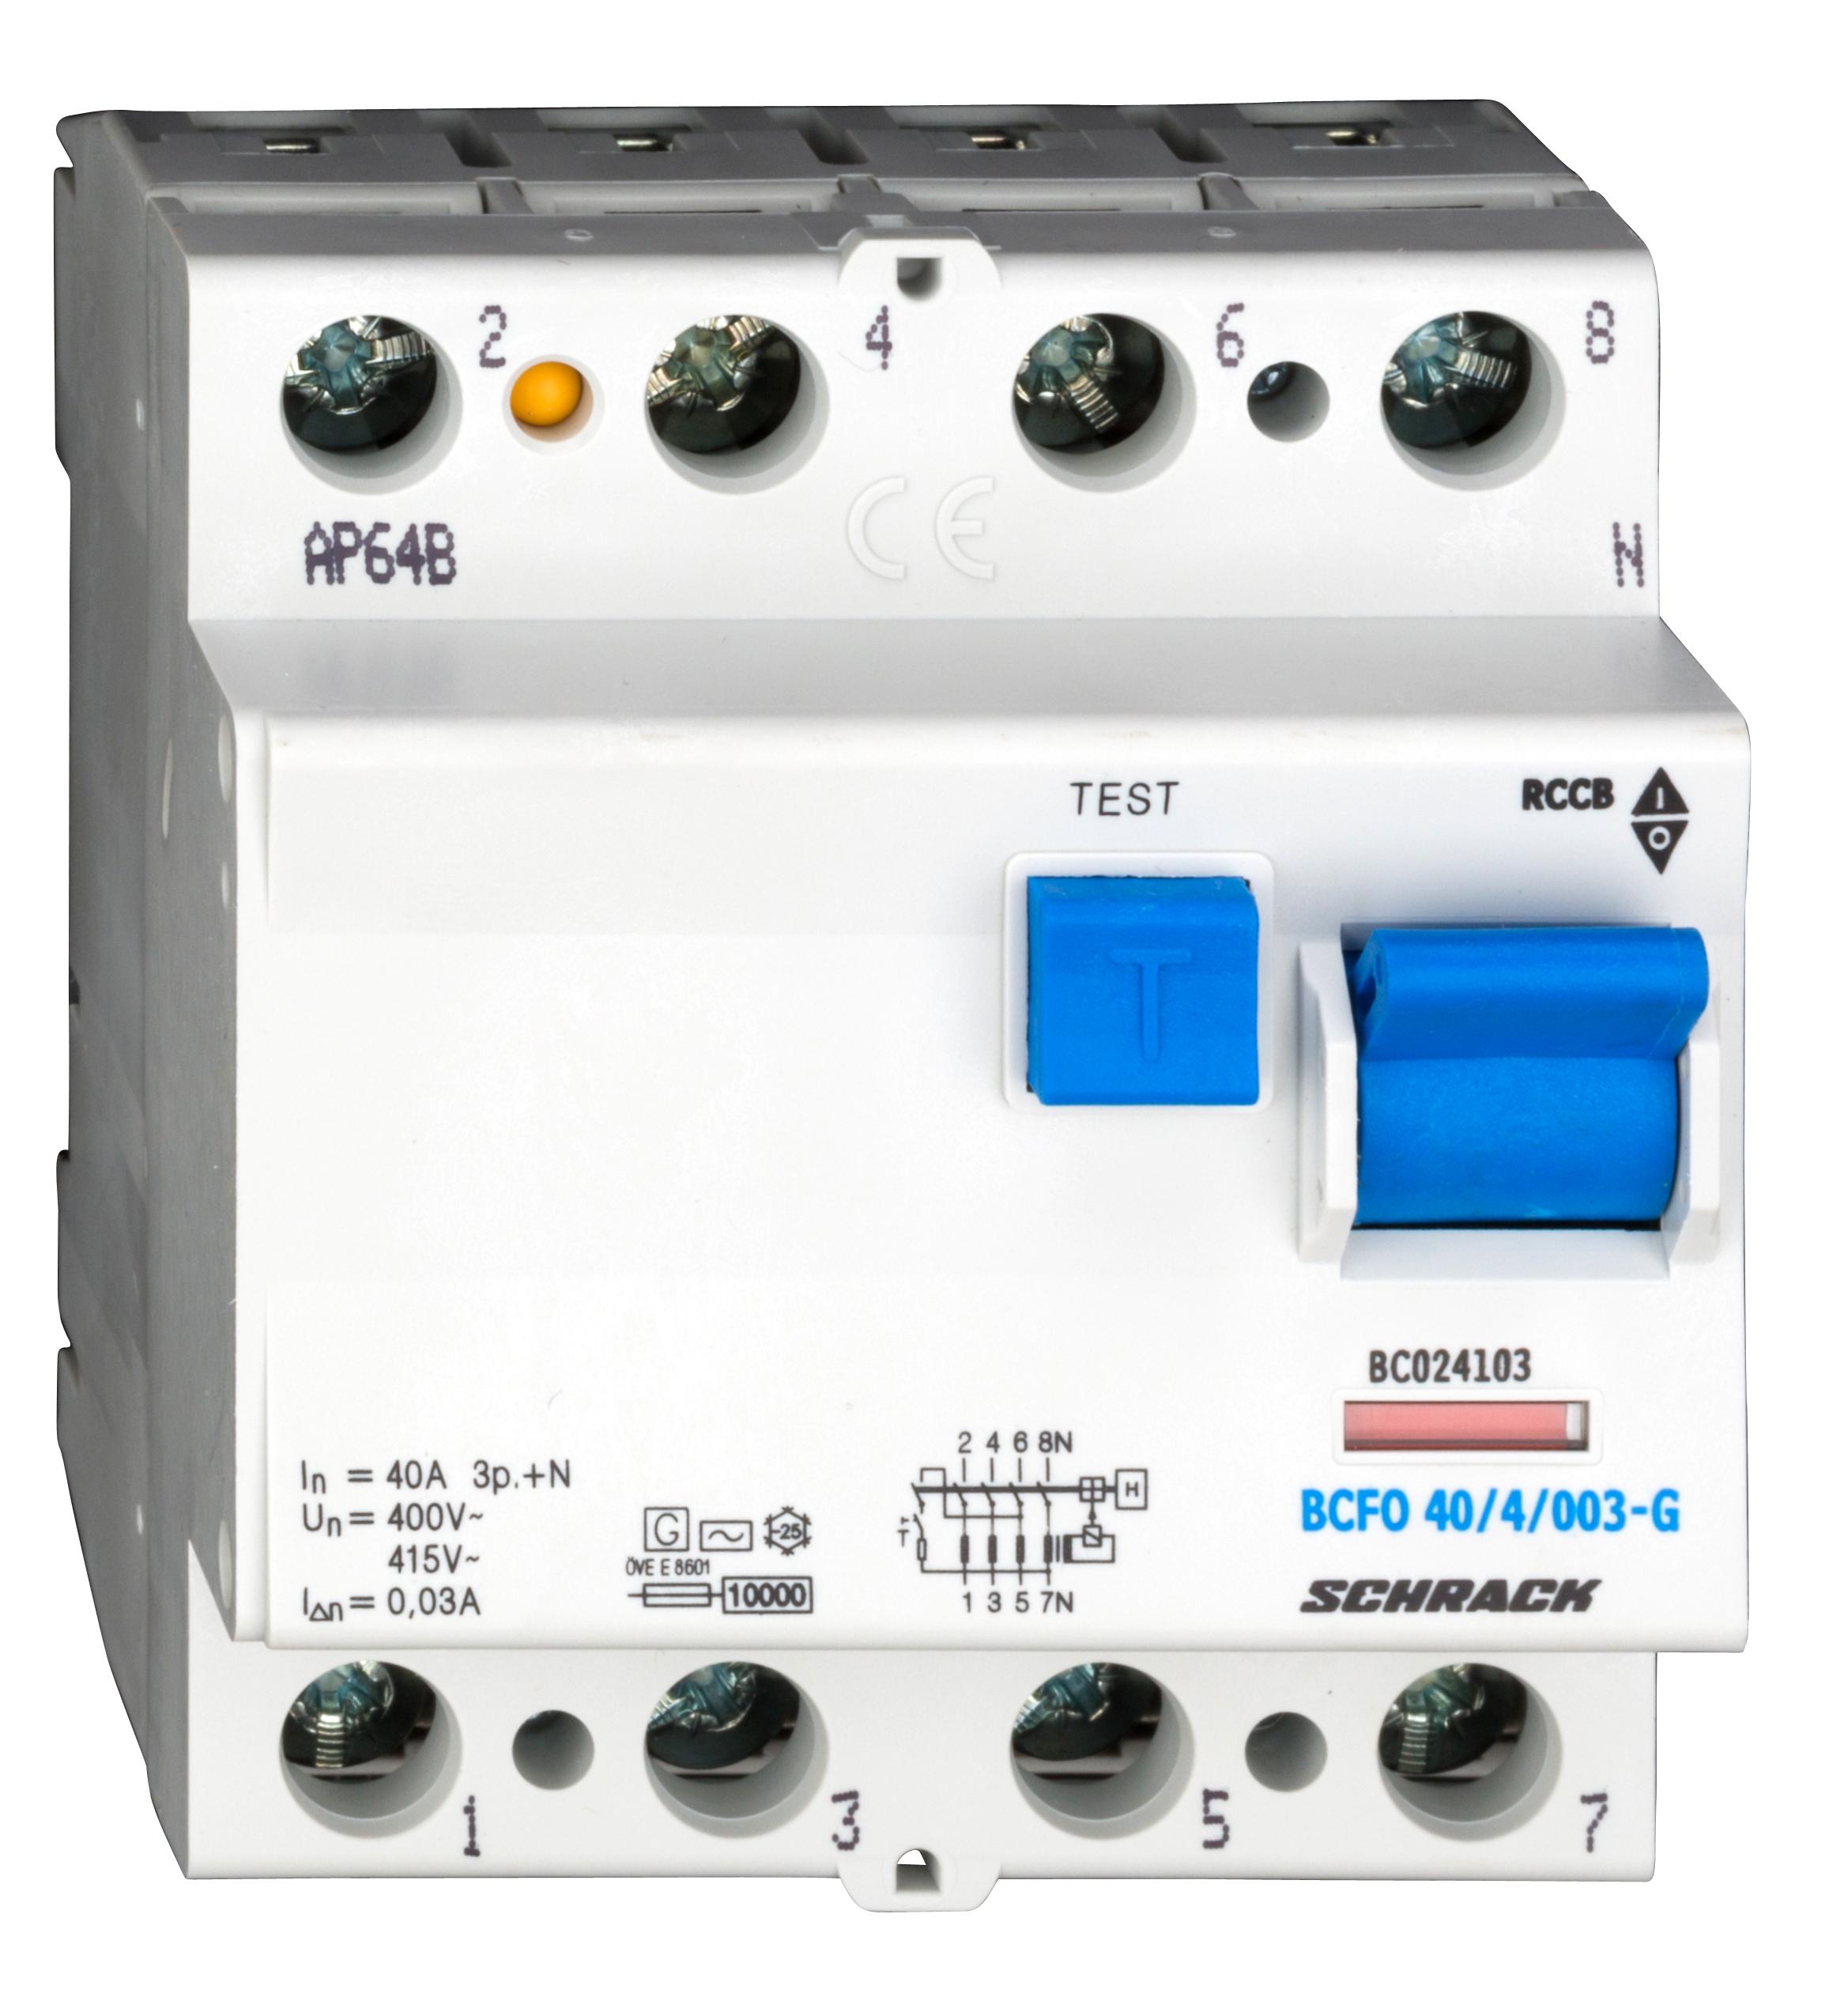 1 Stk FI-Schalter, 40A, 4-polig, 30mA, Bauart G, Typ AC BC024103--